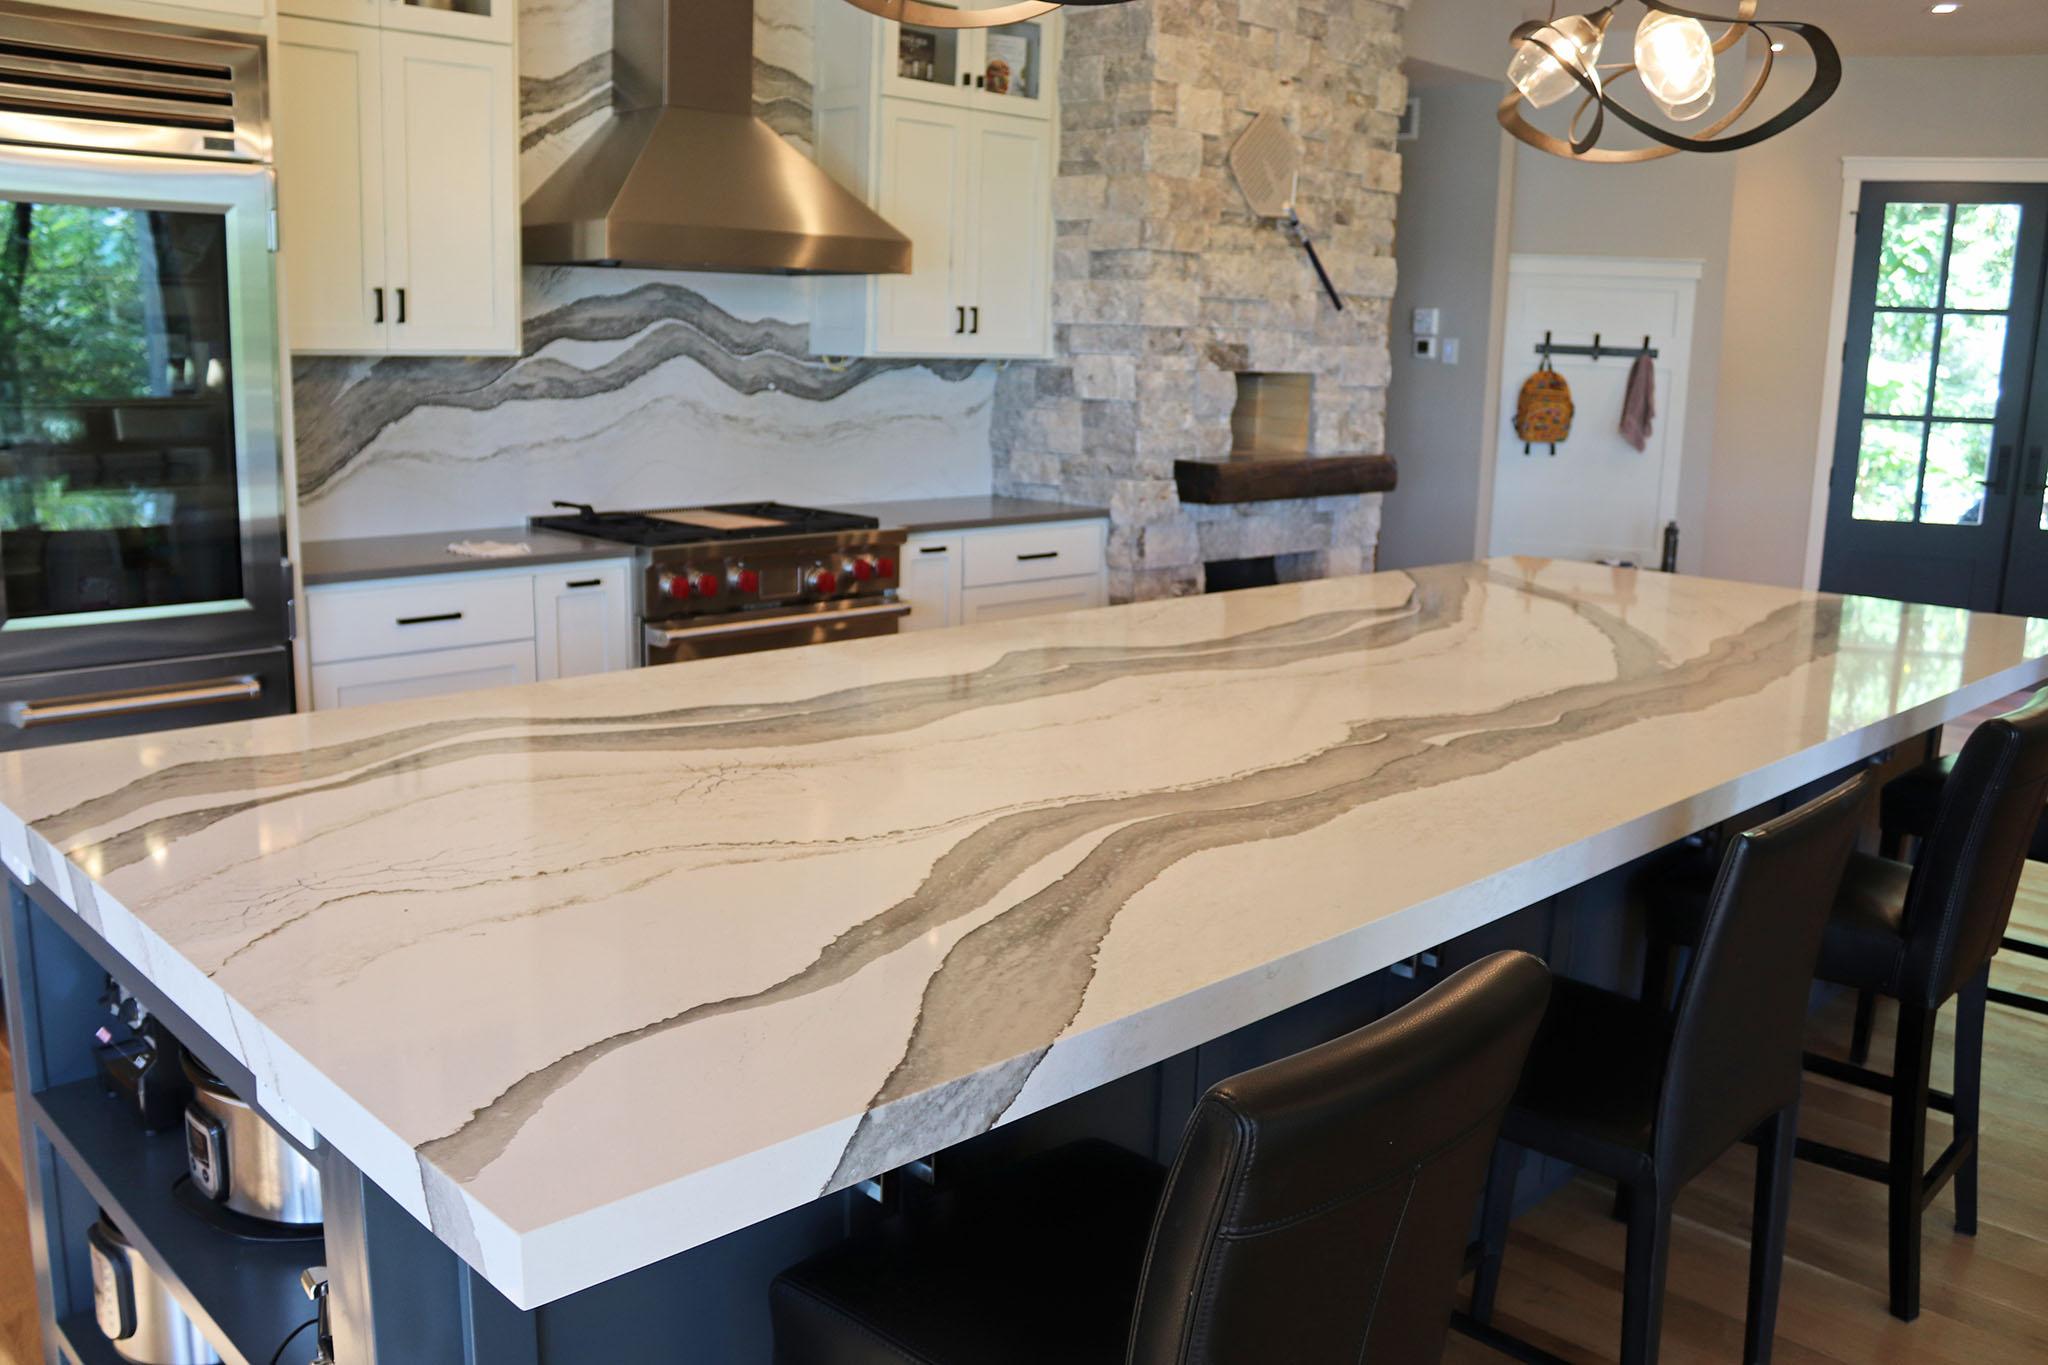 Closeup of kitchen island with digitally designed quartz vein in Cambria countertop